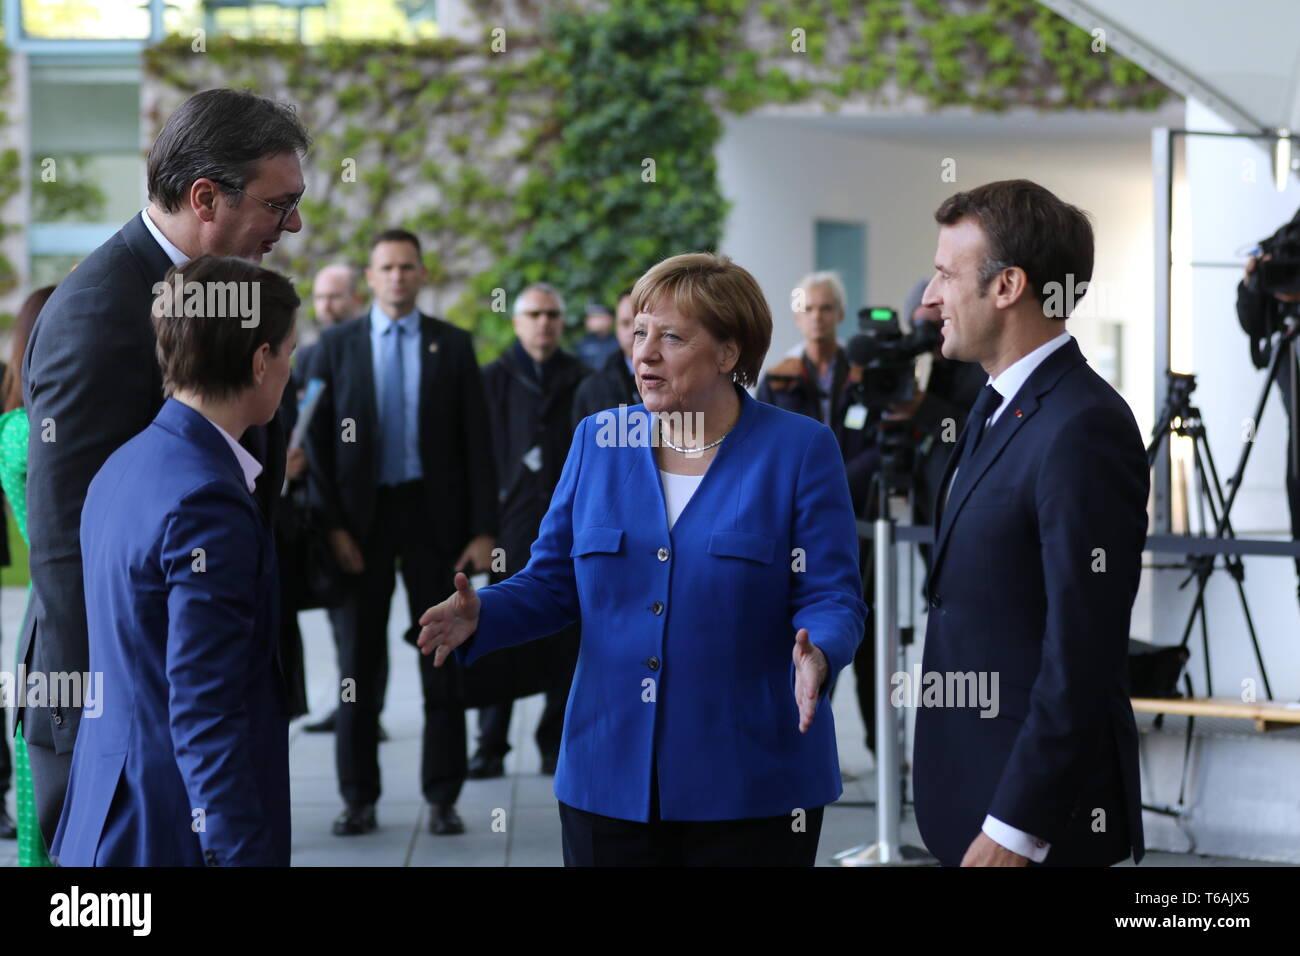 29.04.2019, Berlin, Germany, Chancellor Angela Merkel, Emmanuel Macron, Aleksandar Vucic and Ana Brnabic in the Chancellery. Chancellor Angela Merkel  - Stock Image